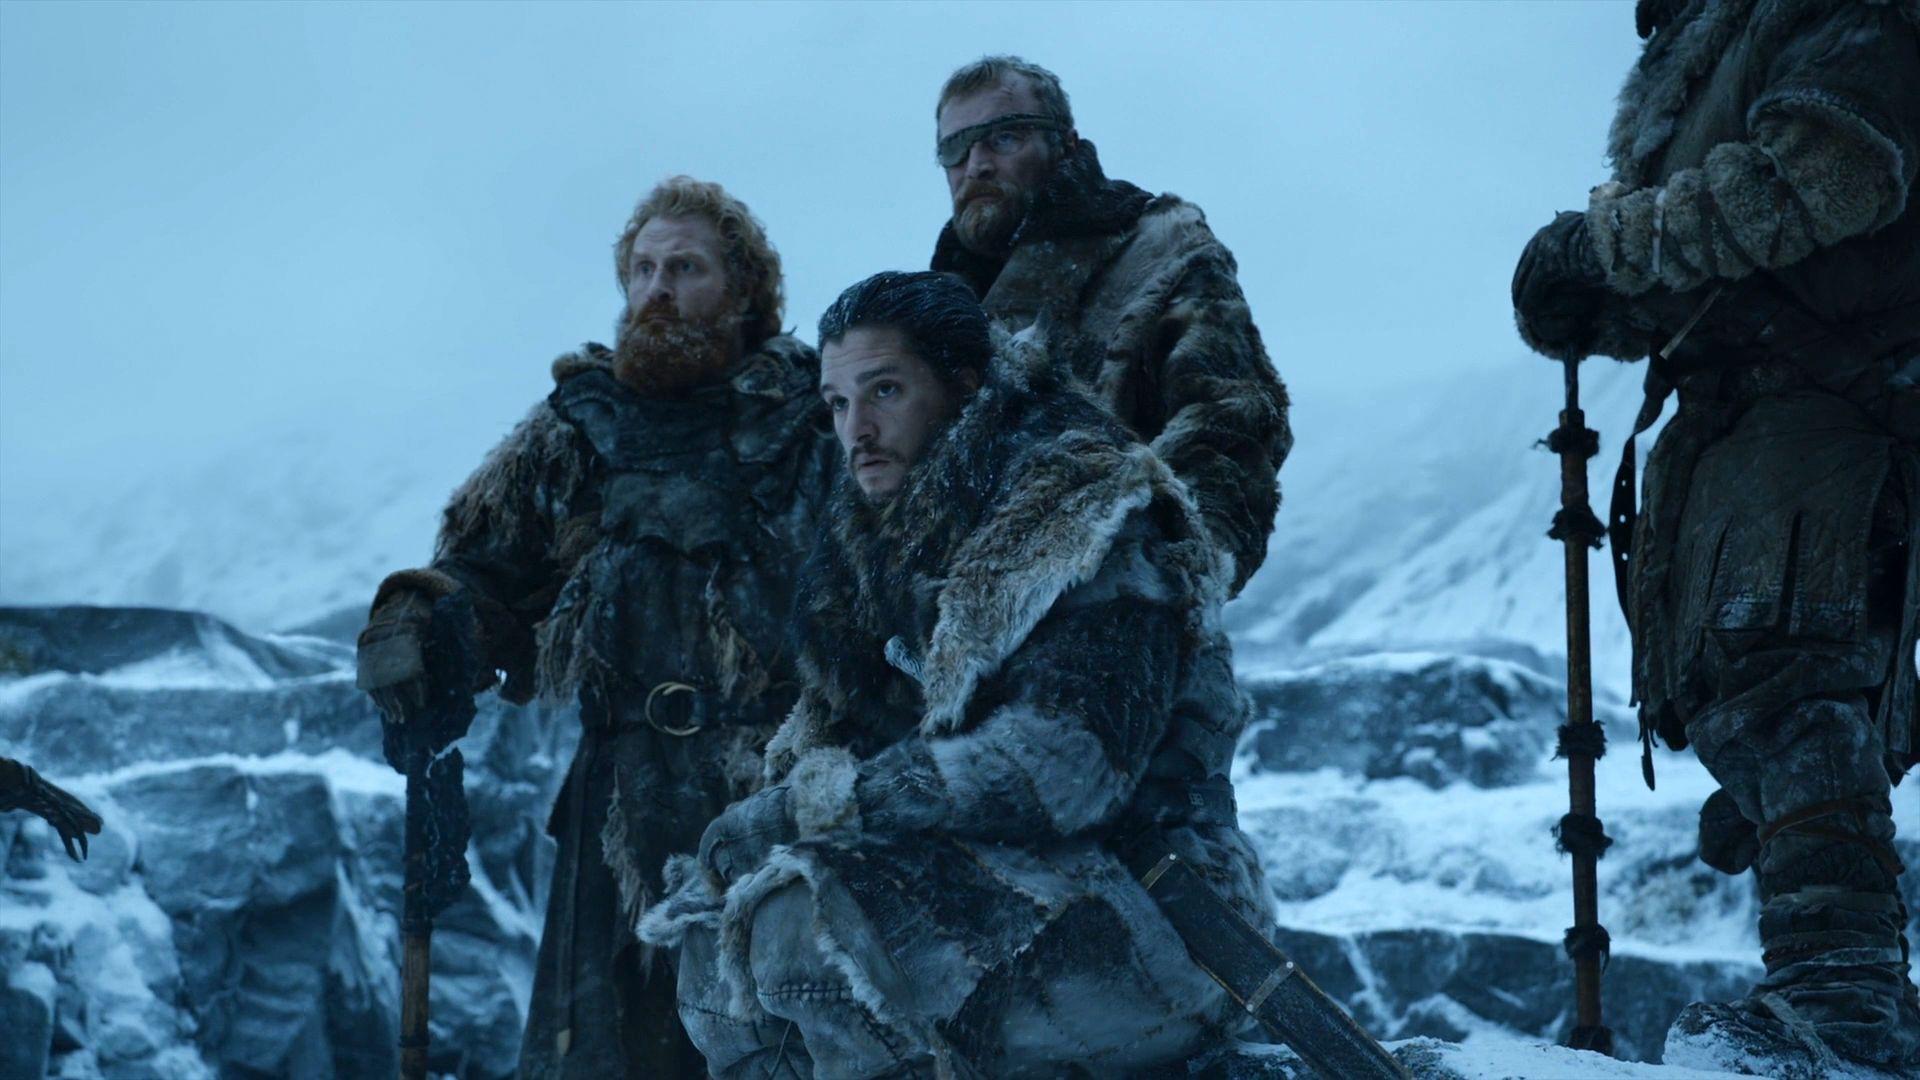 Beyond The Wall Game Of Thrones S07e06 Tvmaze